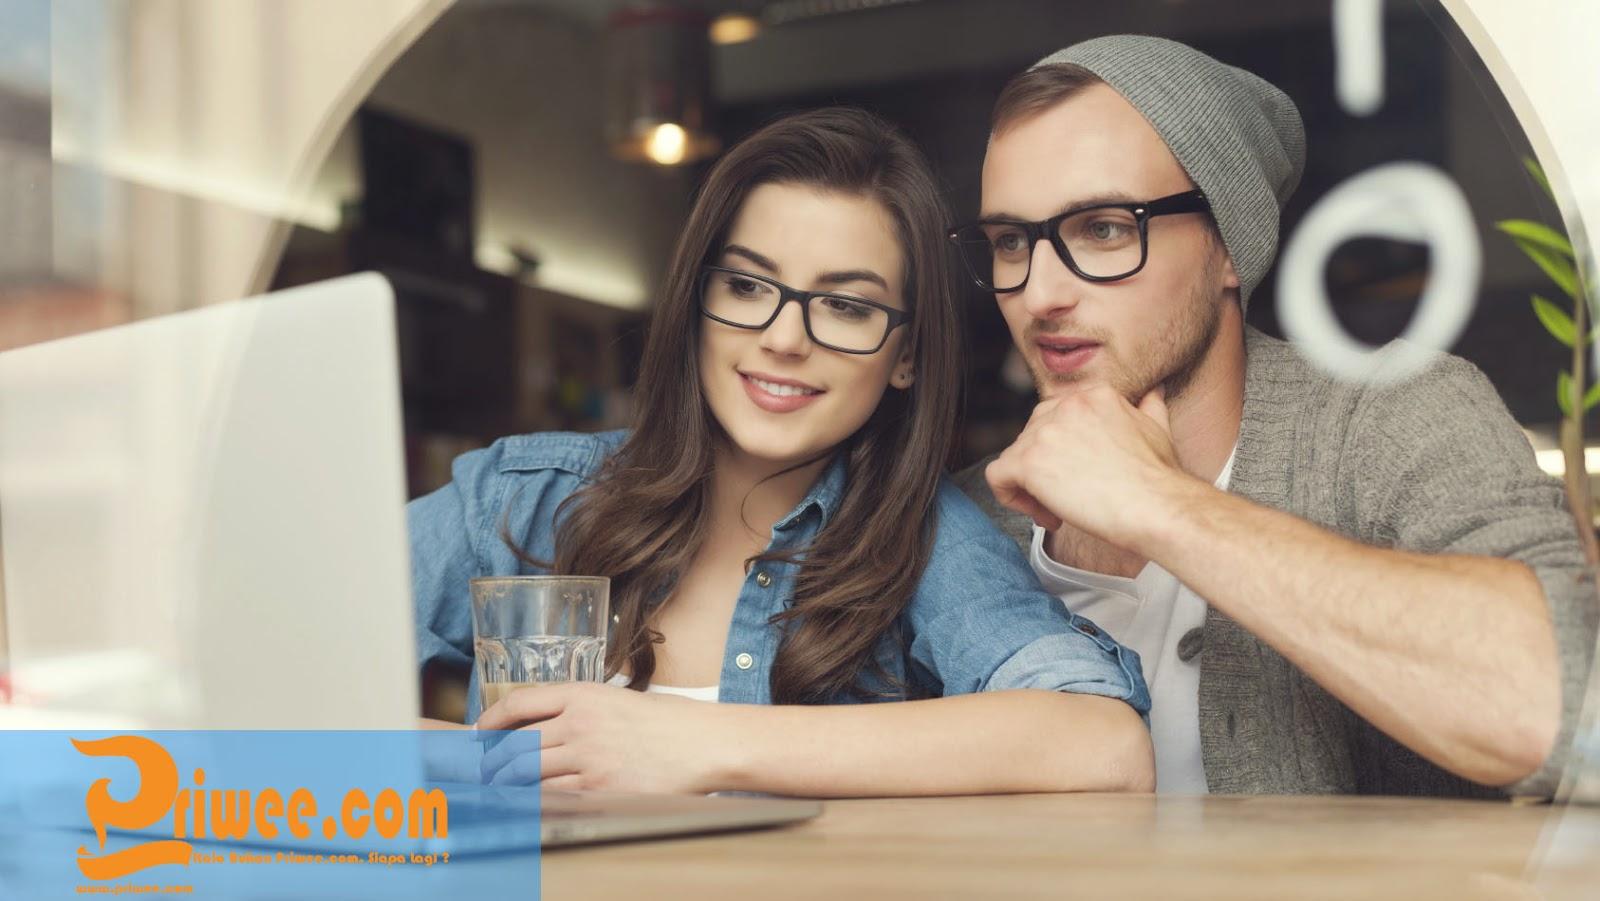 Hidupmu Menuju ke Arah Yang Lebih Baik Dengan Pasanganmu